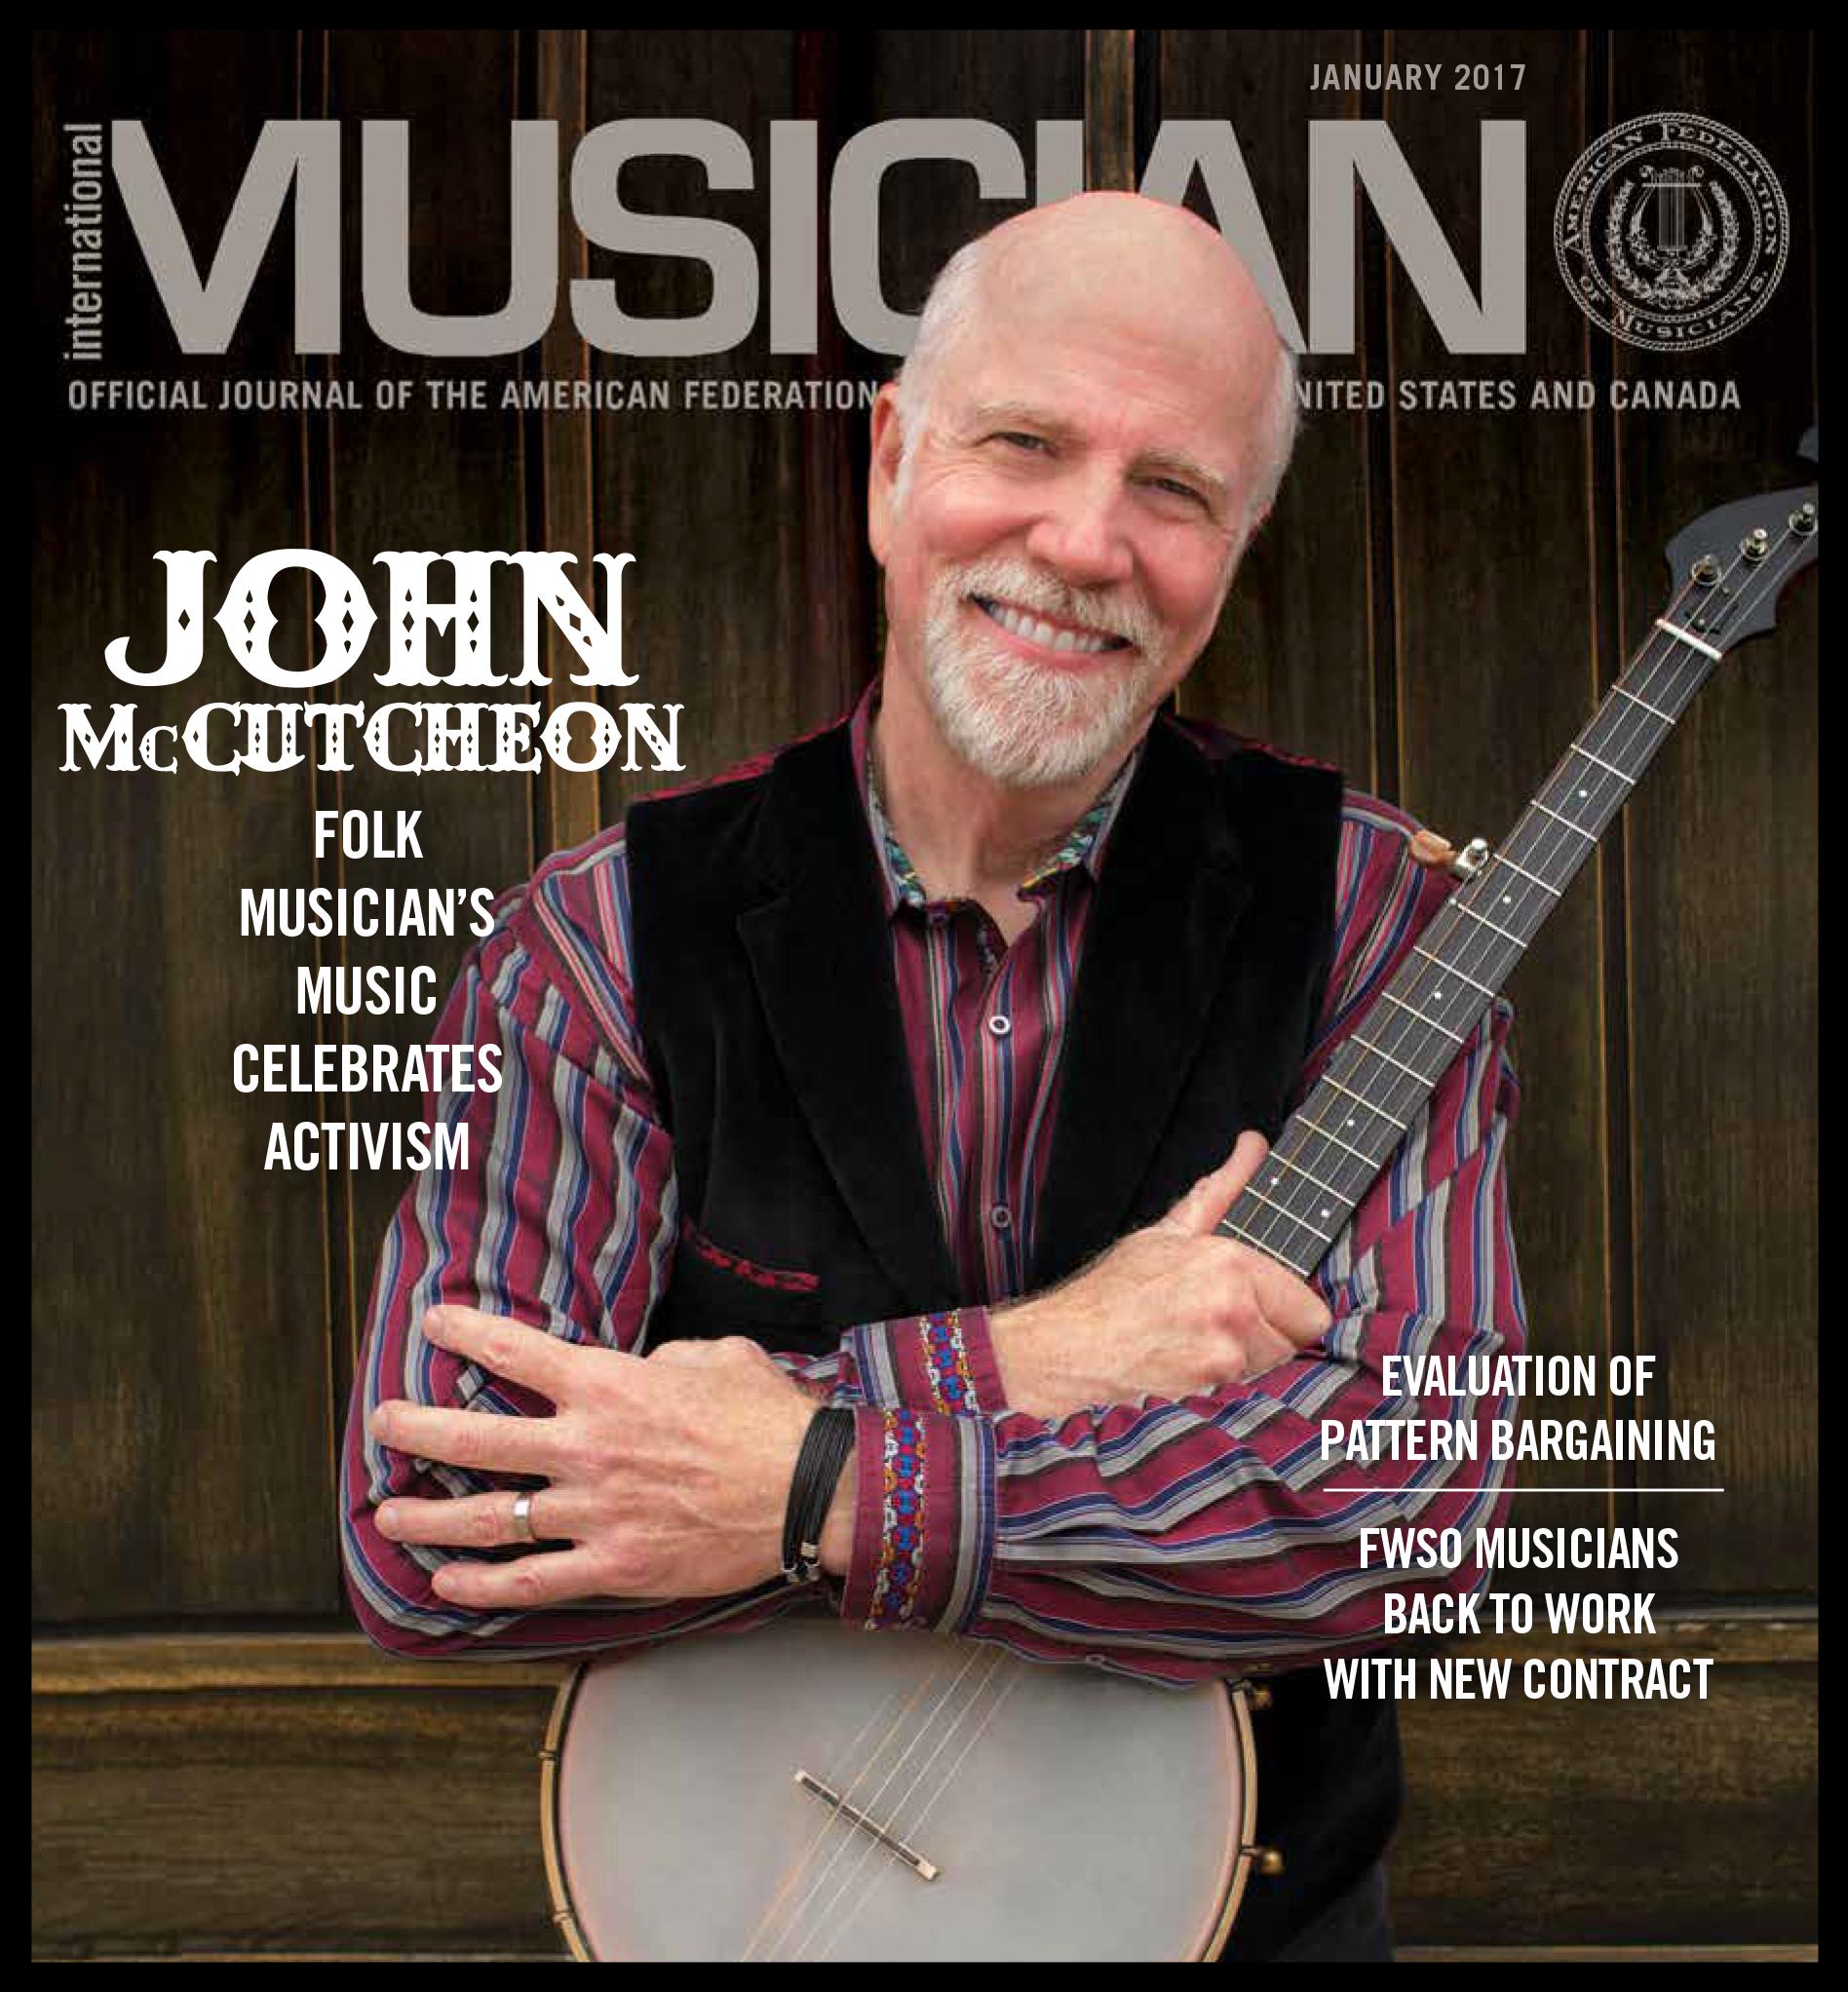 V115-01 - January 2017 - International Musician Magazine